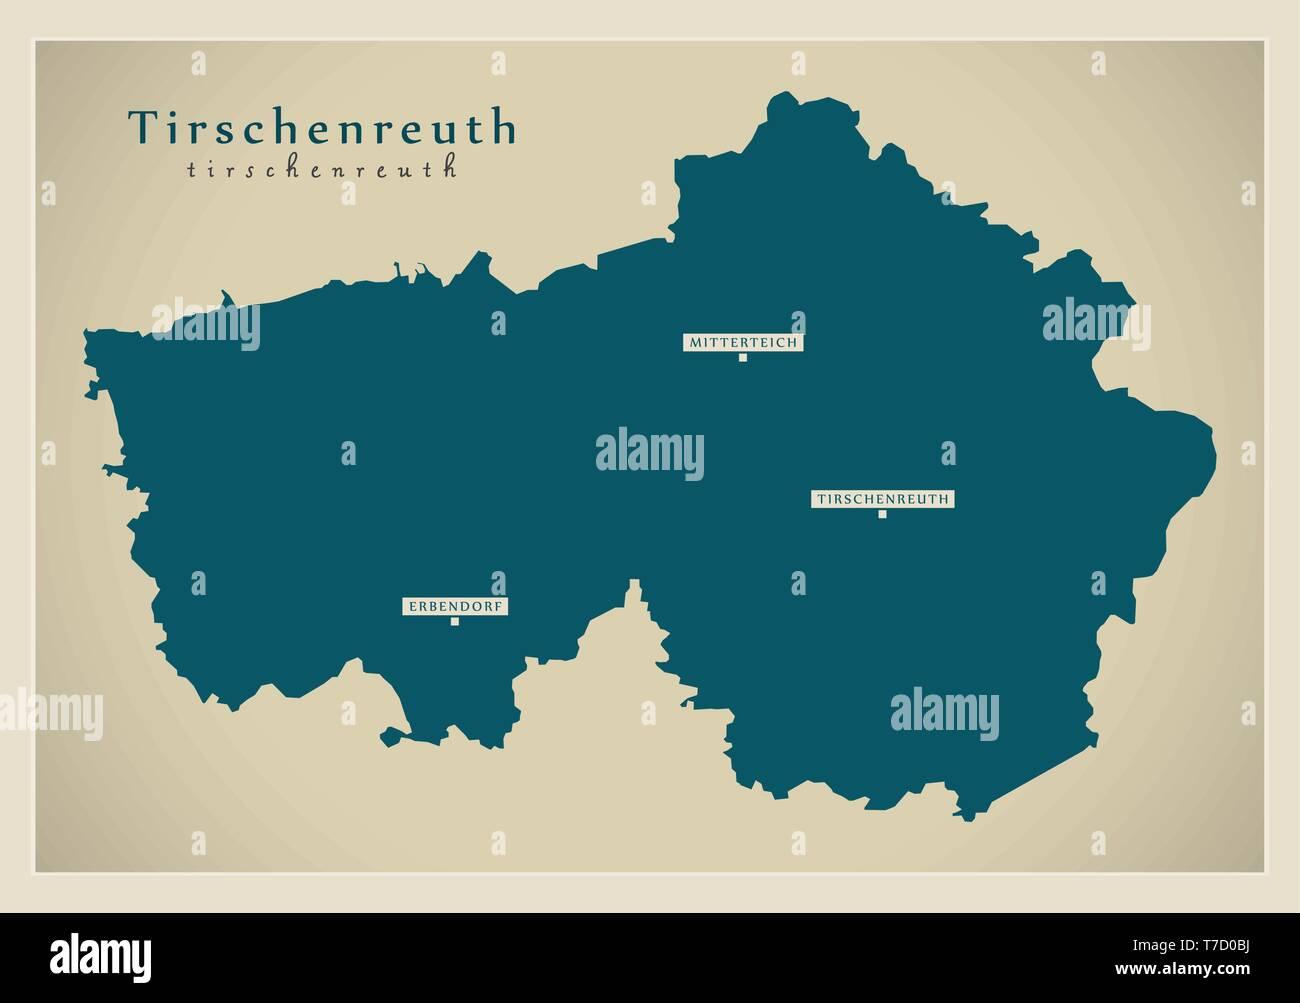 Tirschenreuth Stock Photos & Tirschenreuth Stock Images - Alamy